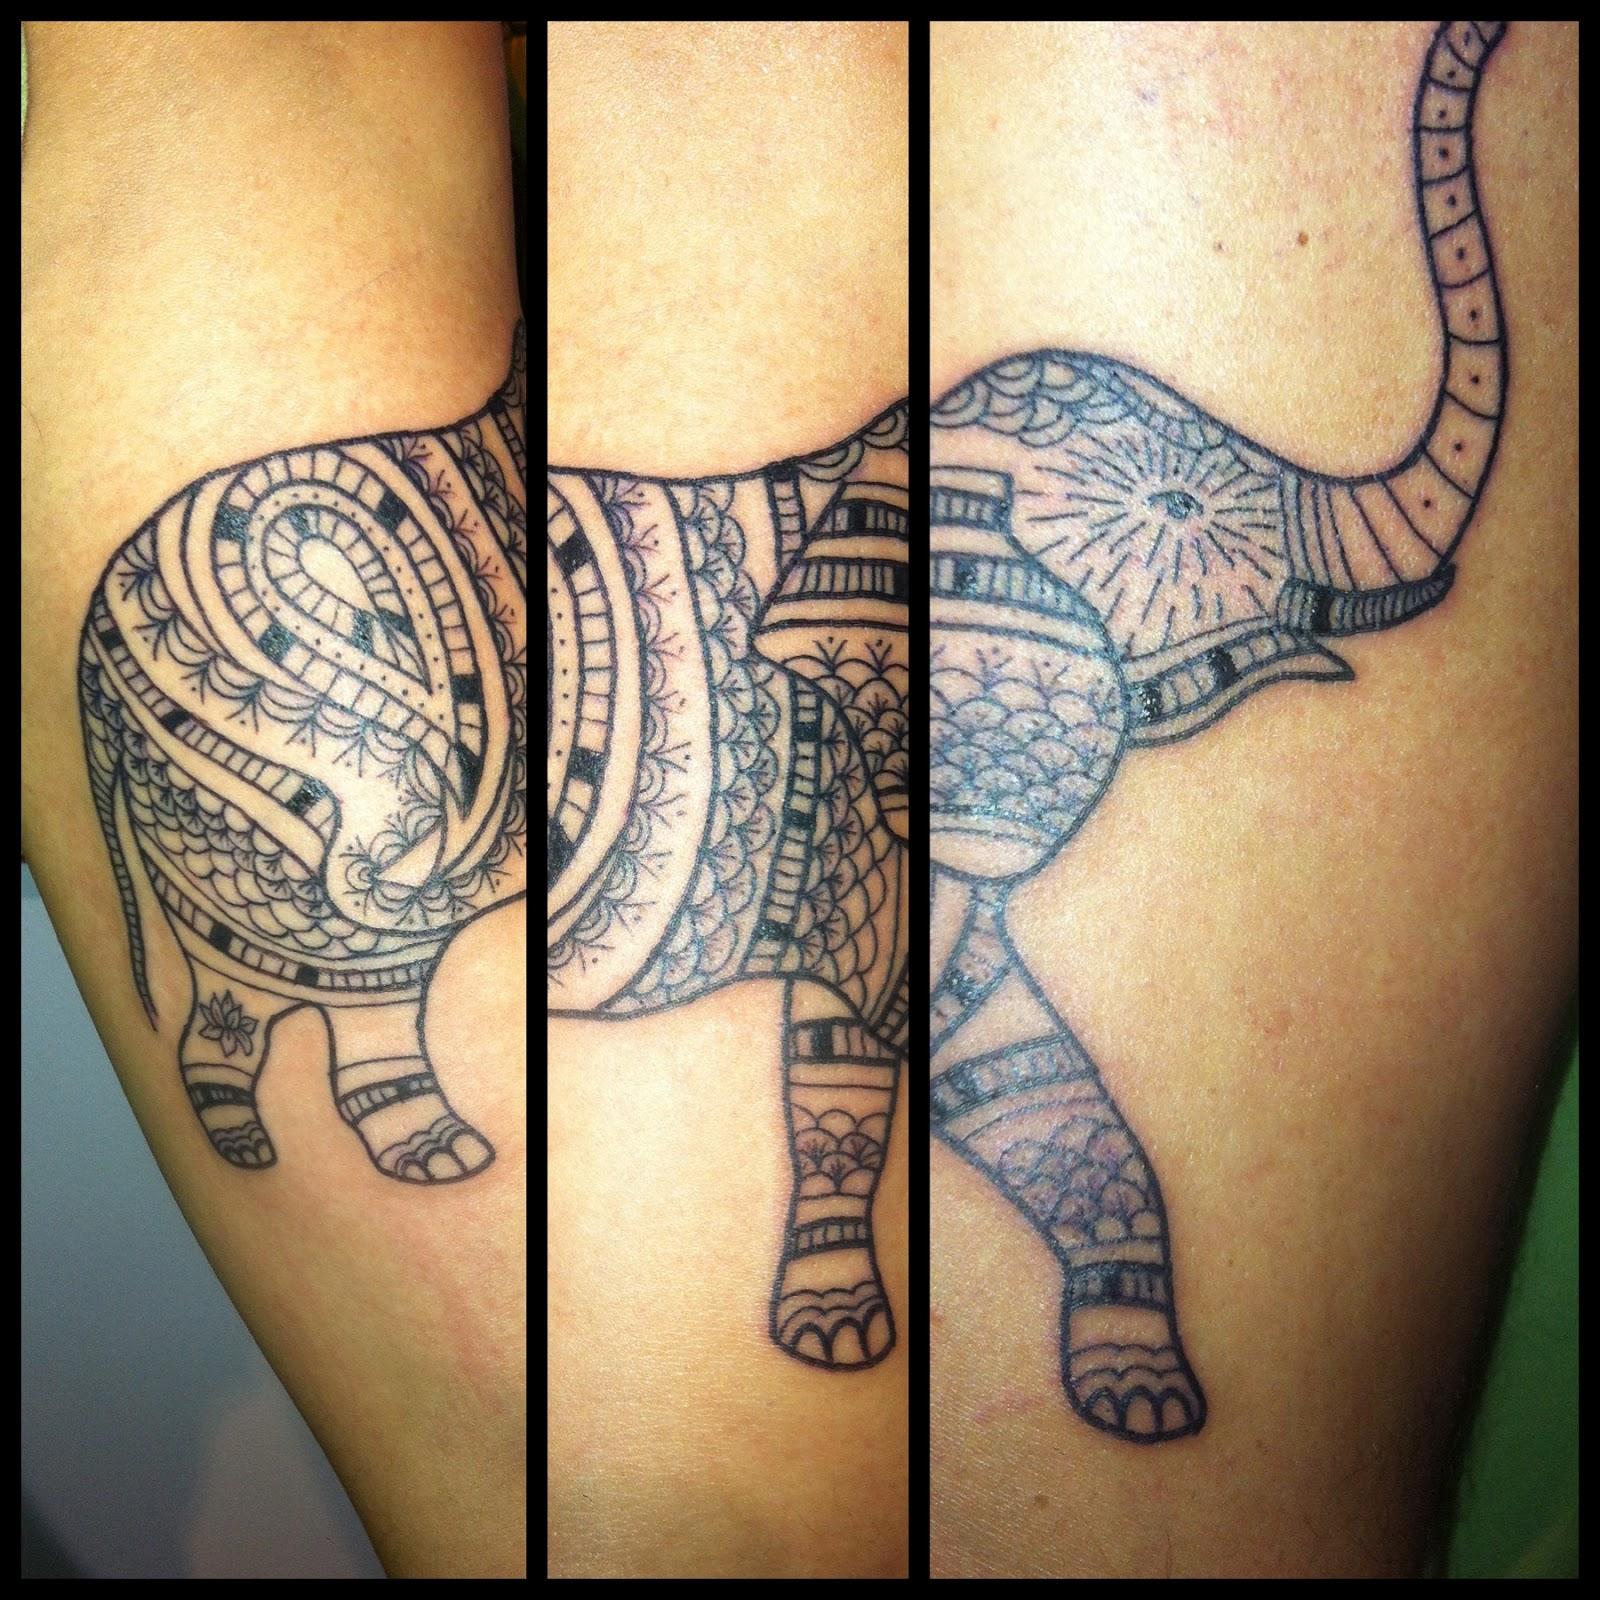 Elephant tattoo meaning - photo#28